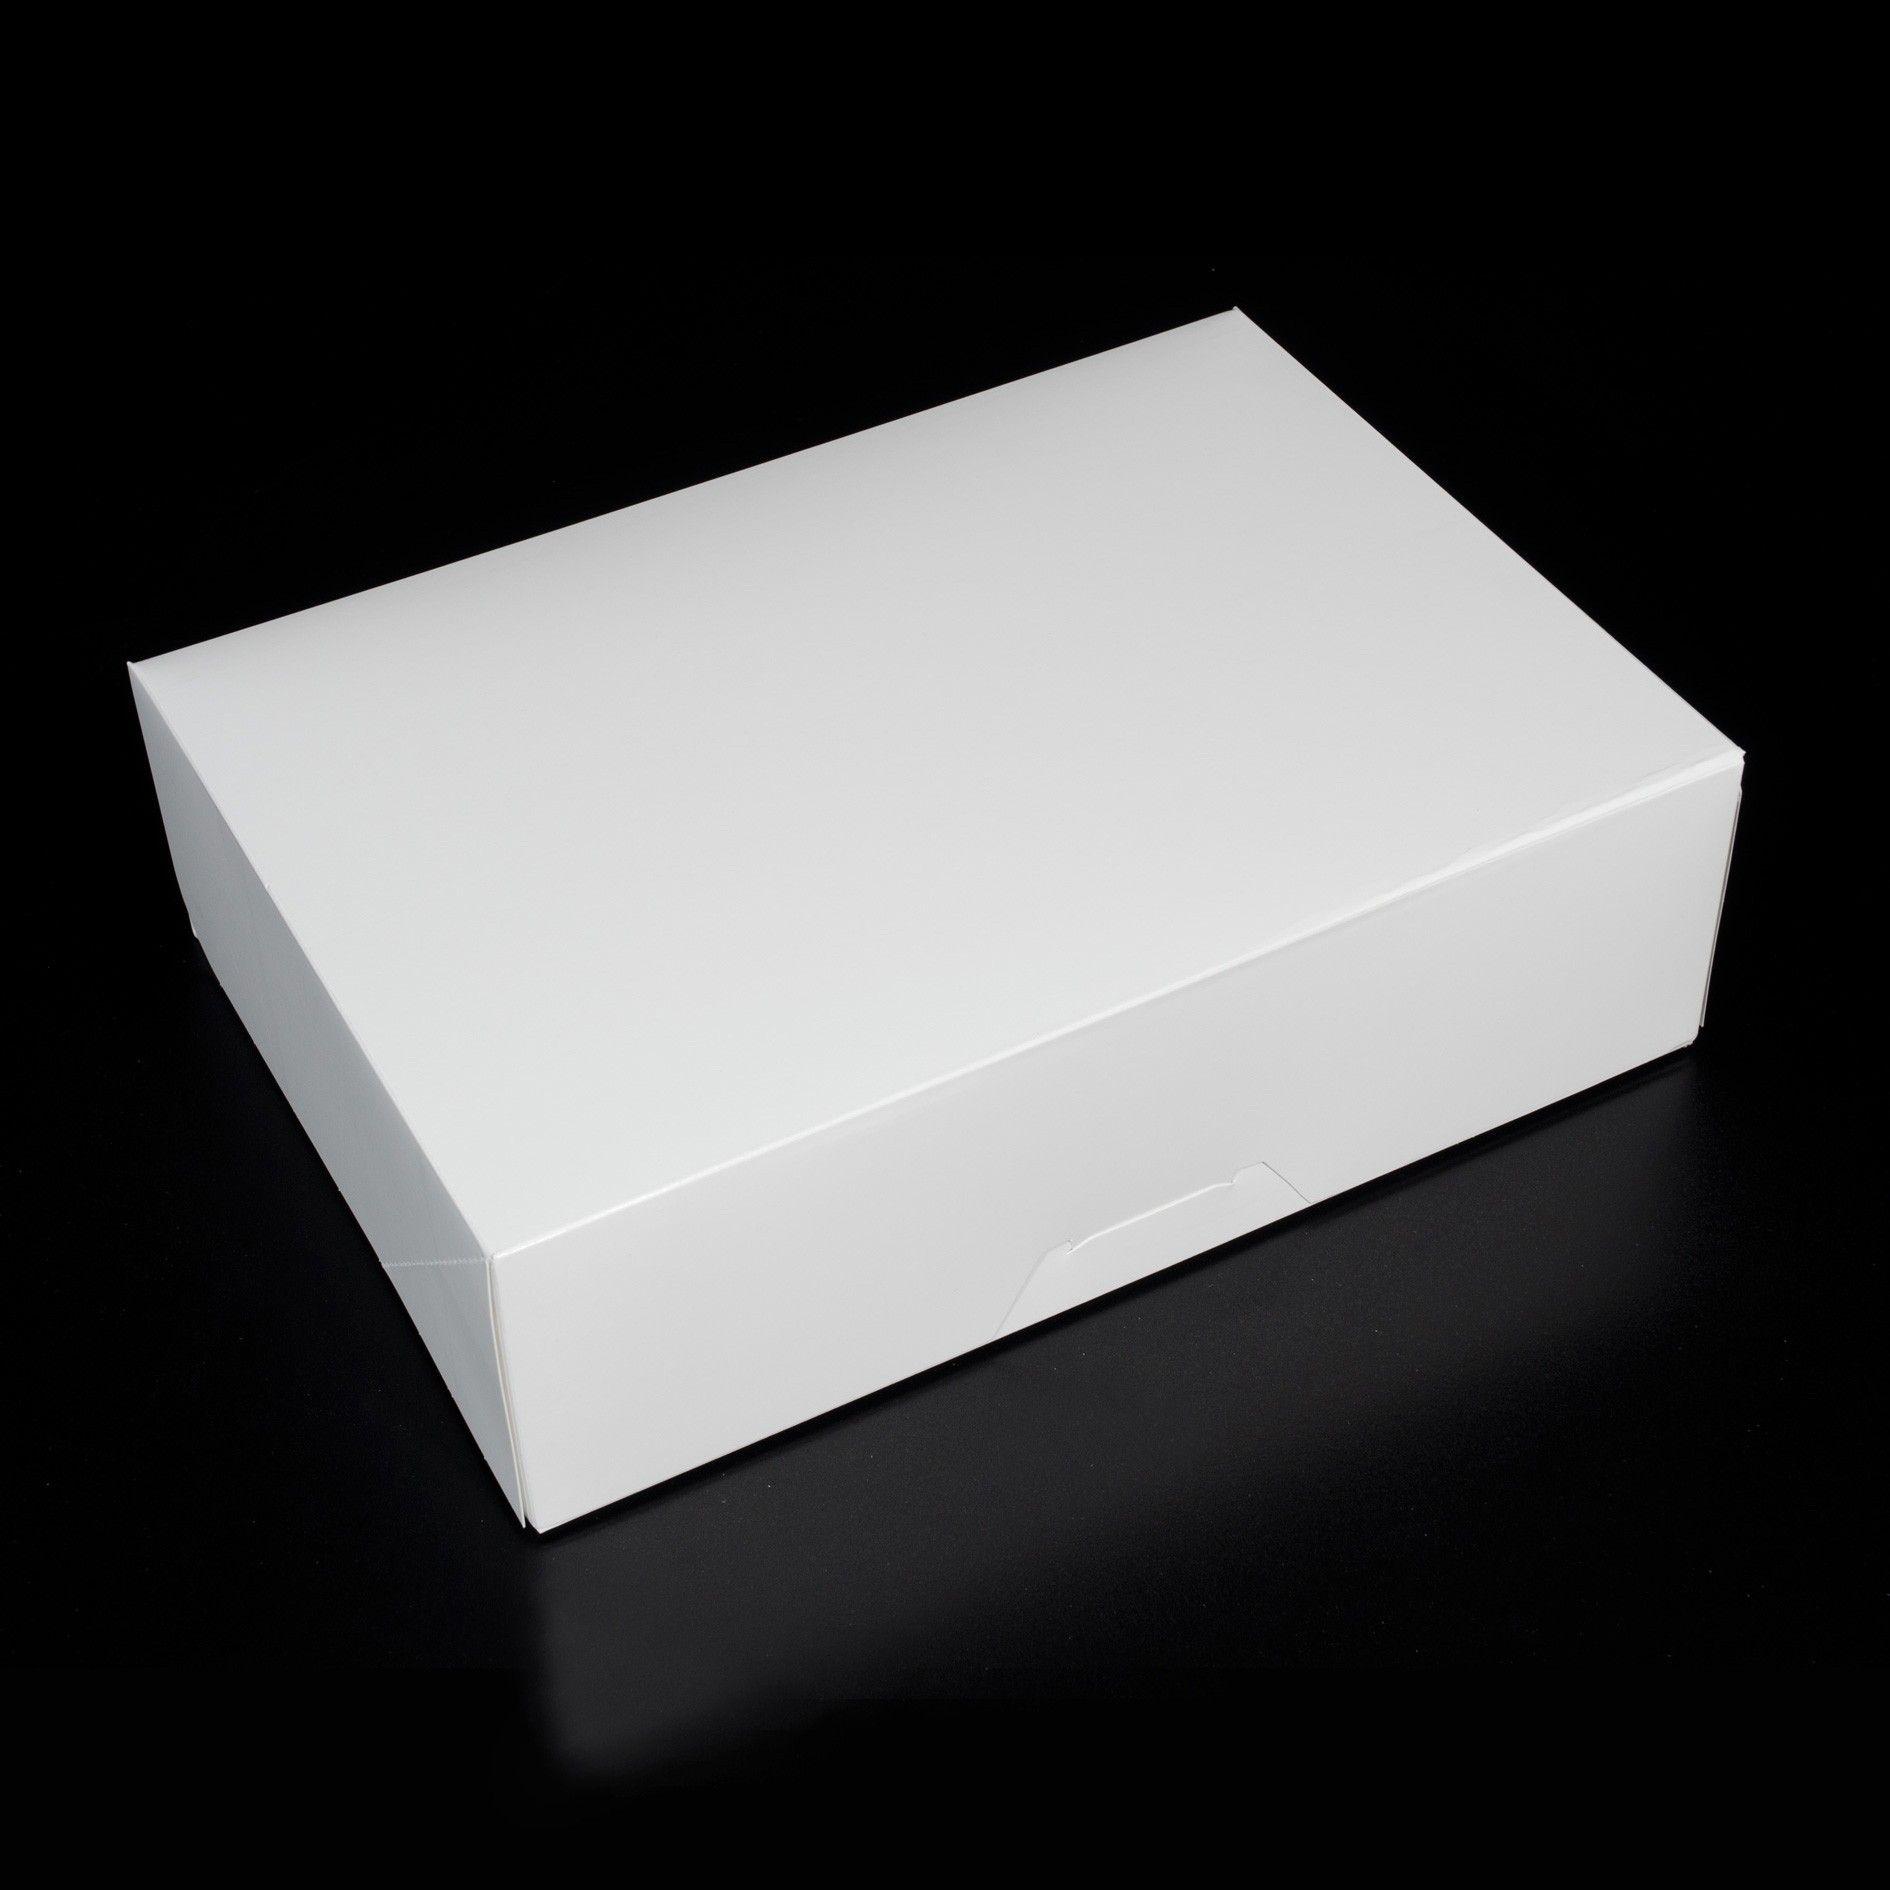 14 x 10 x 4.25 - 1/4 sheet cake box / dozen cupcake box / cookie box - no window (10 pack)